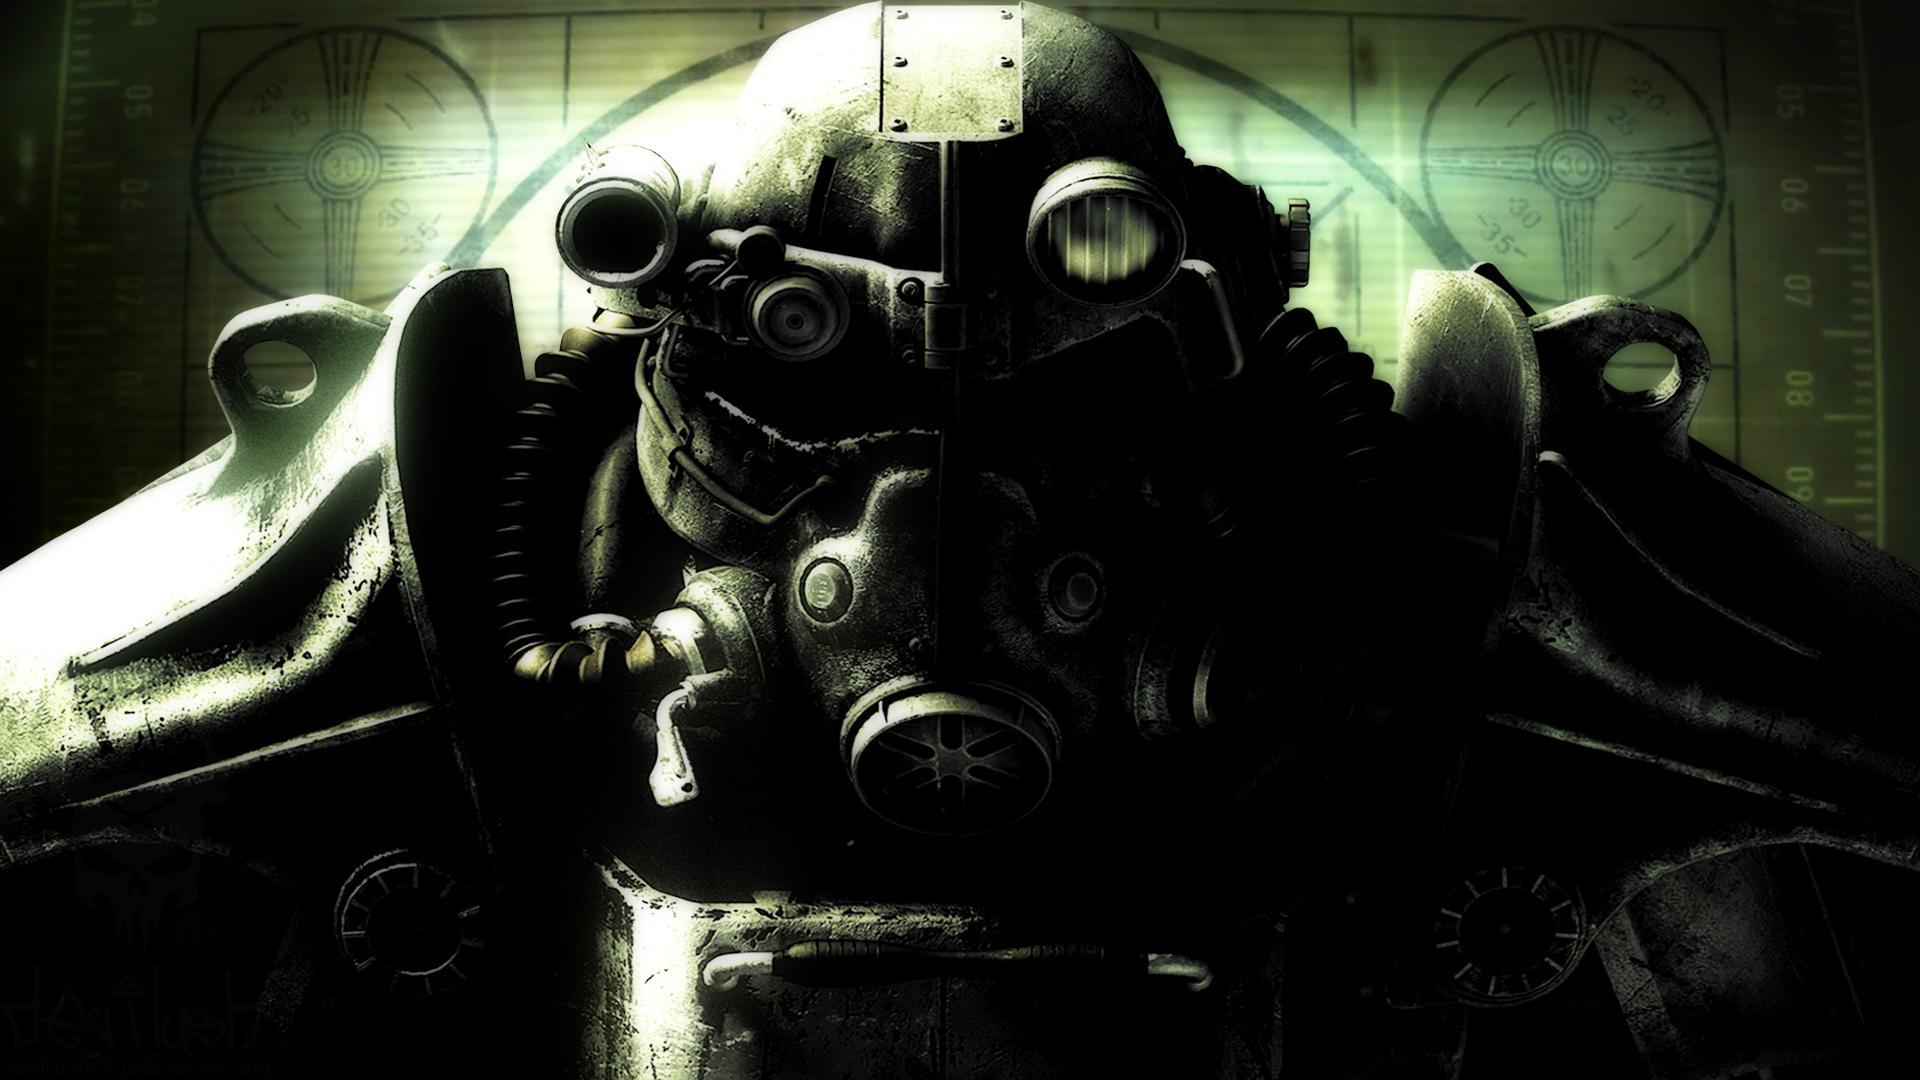 DeviantArt More Like Fallout 3 BoS PS3 HD Wallpaper By DEVILUSHNINJA